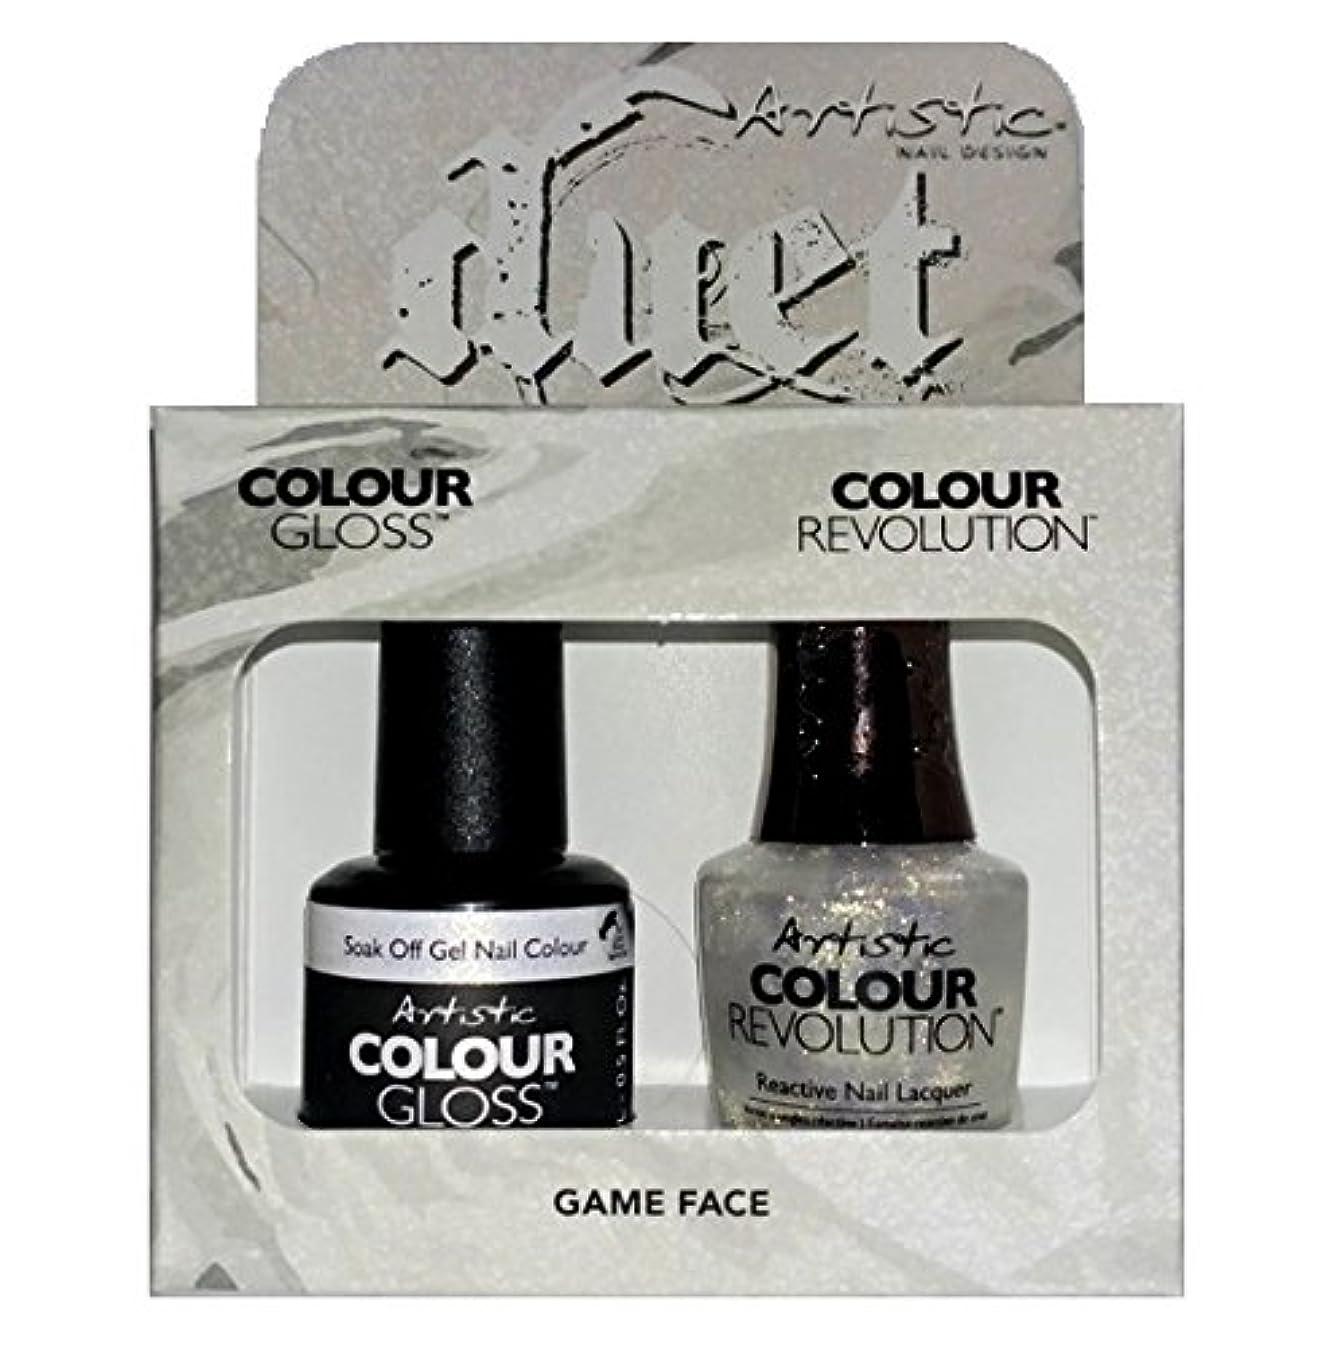 監査信条先住民Artistic Nail Design - Duet Gel & Polish Duo - Game Face - 15 mL / 0.5 oz each